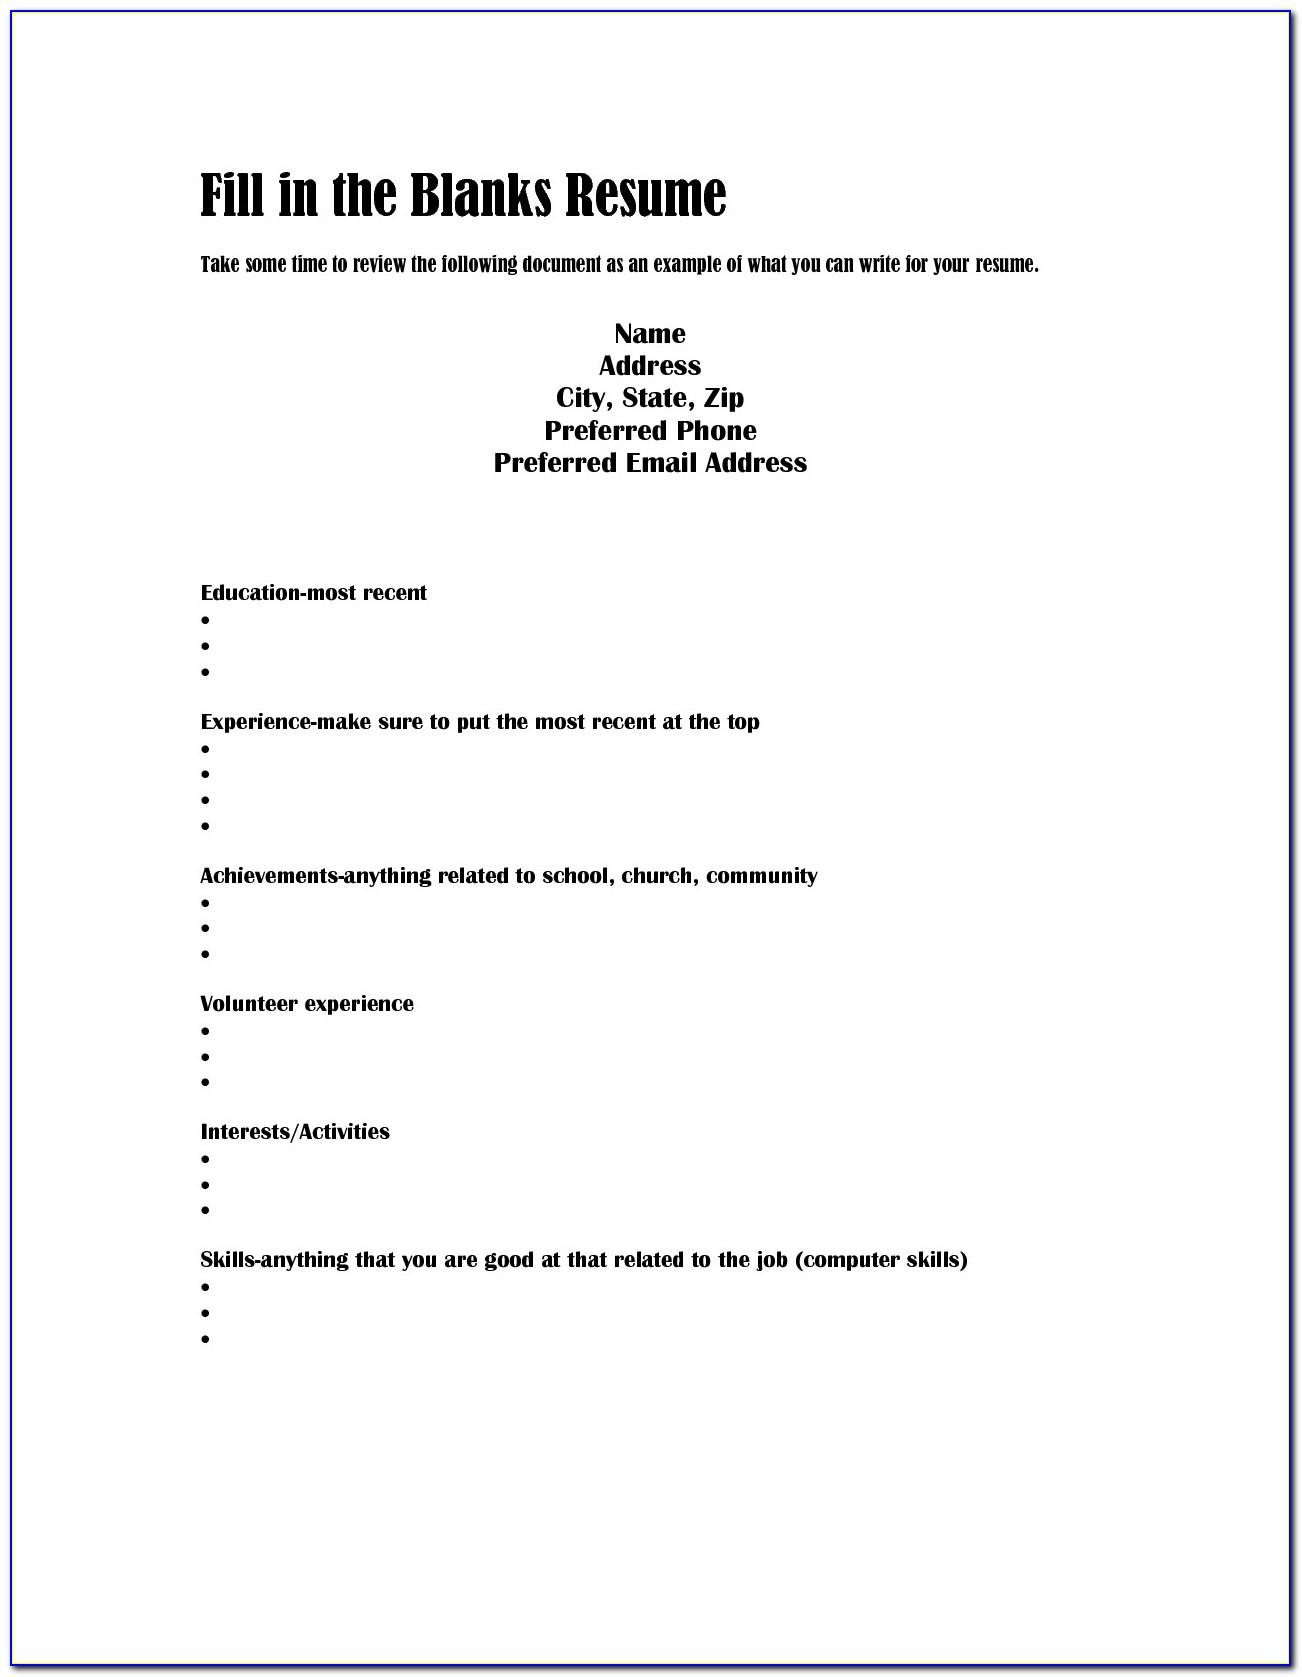 Resume Builder Fill In The Blanks